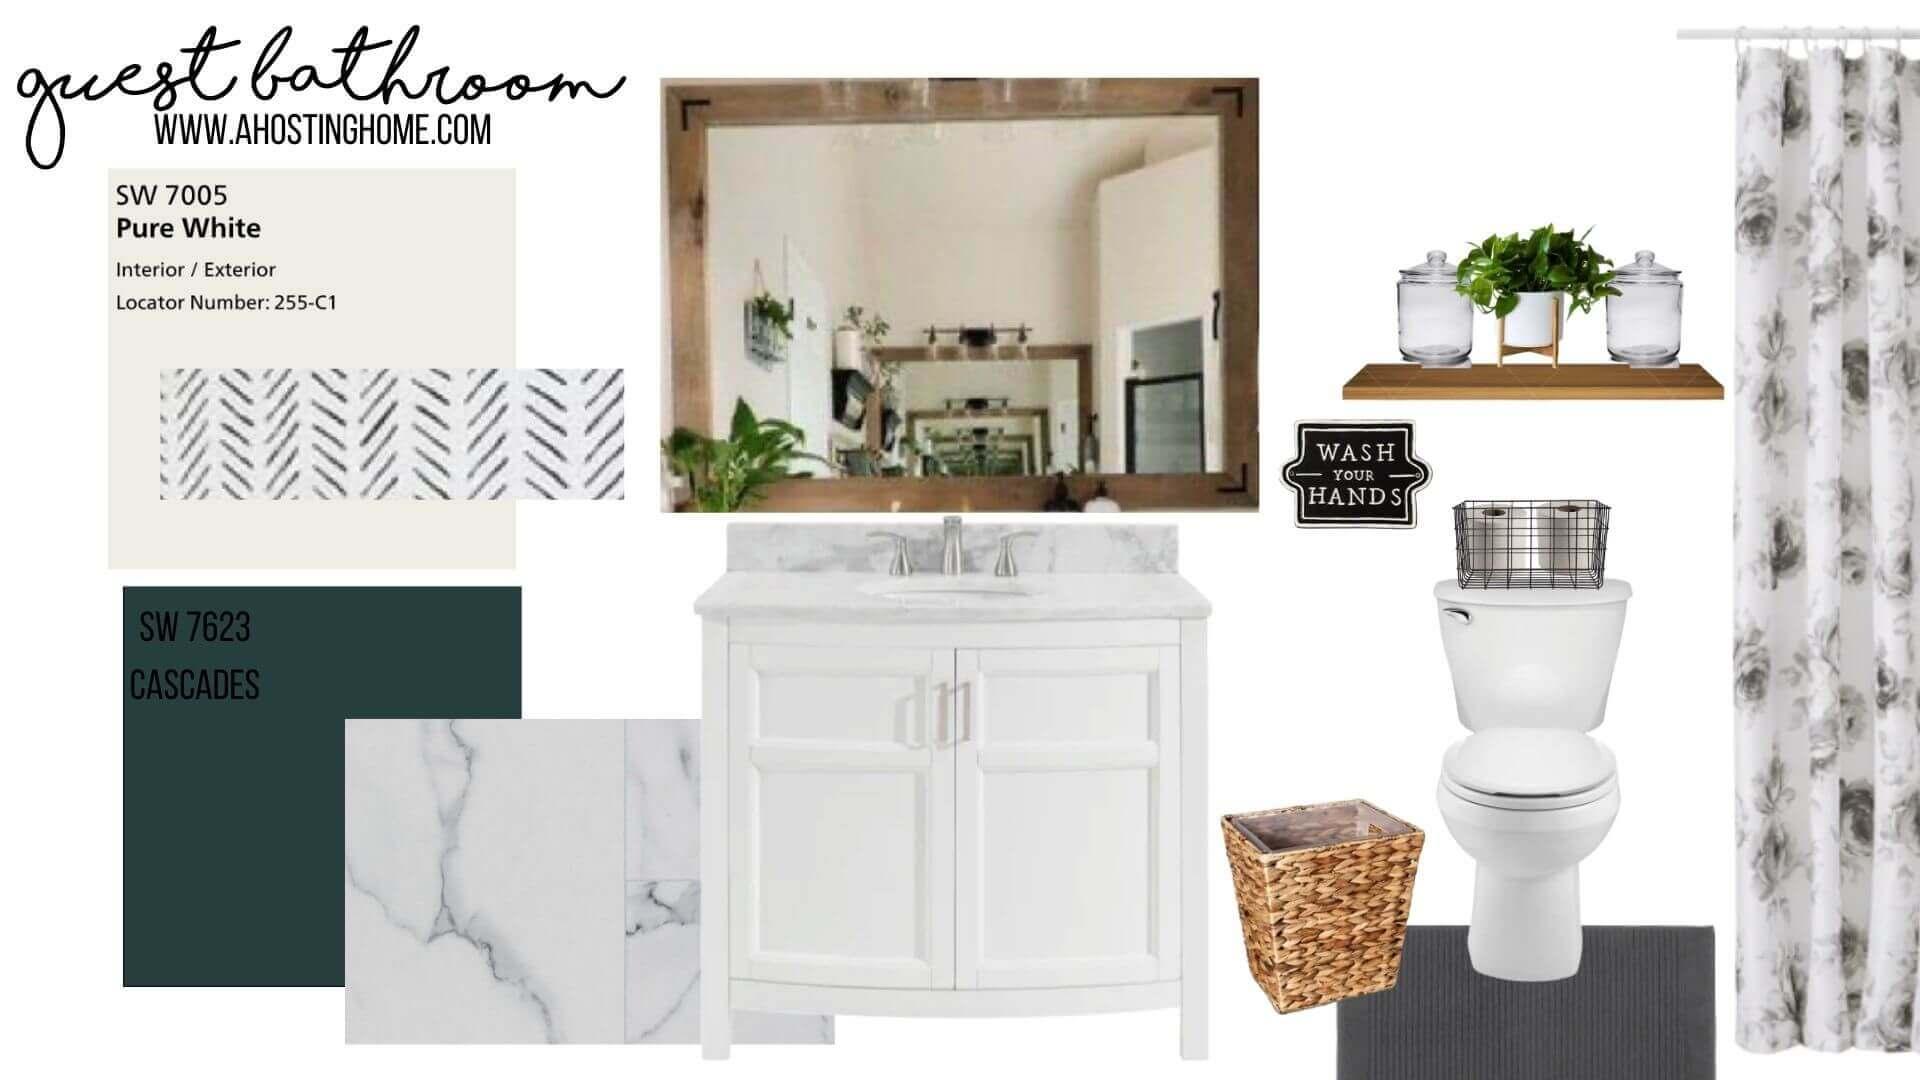 How To Make a Design Board (for free!) / A Hosting Home Blog